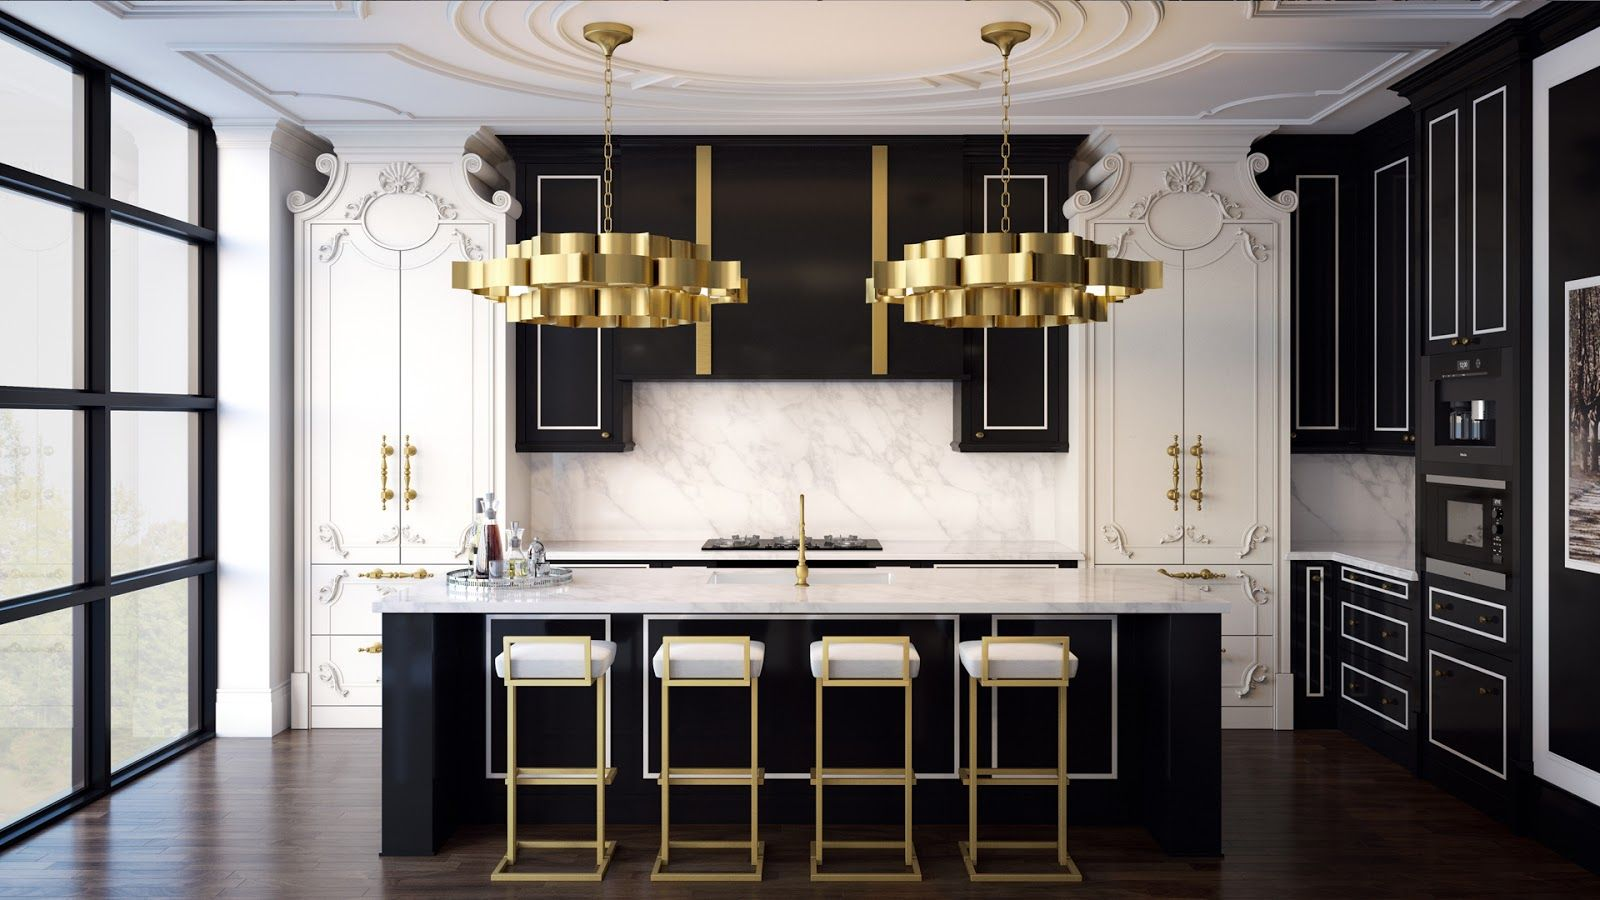 Designer Of The Week July 4th Home Decor Kitchen Luxury